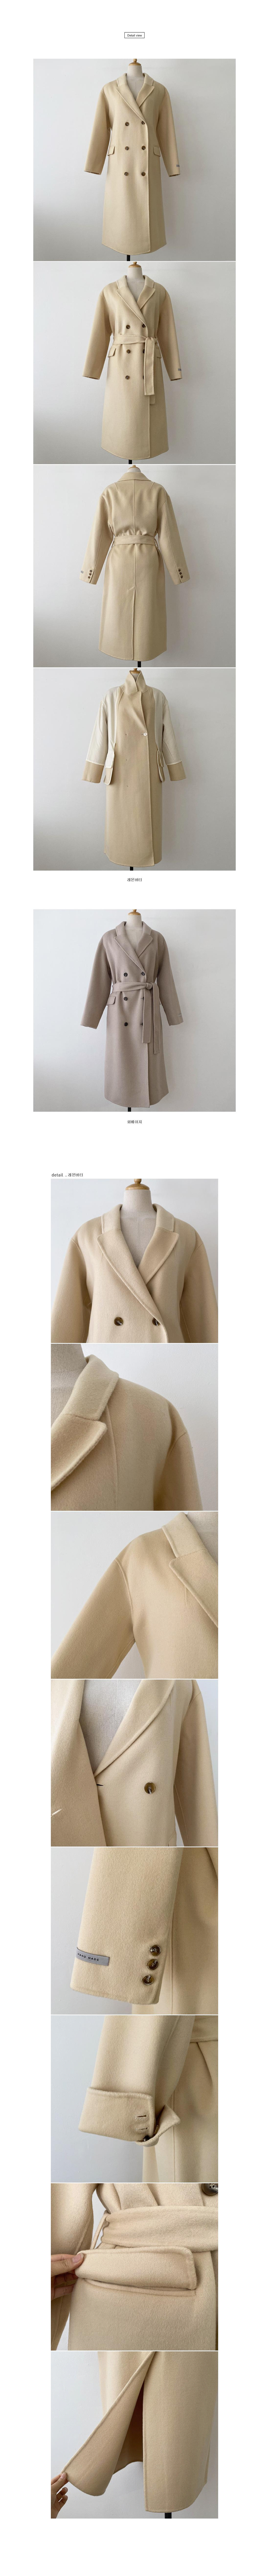 Sting Double Handmade Long Coat